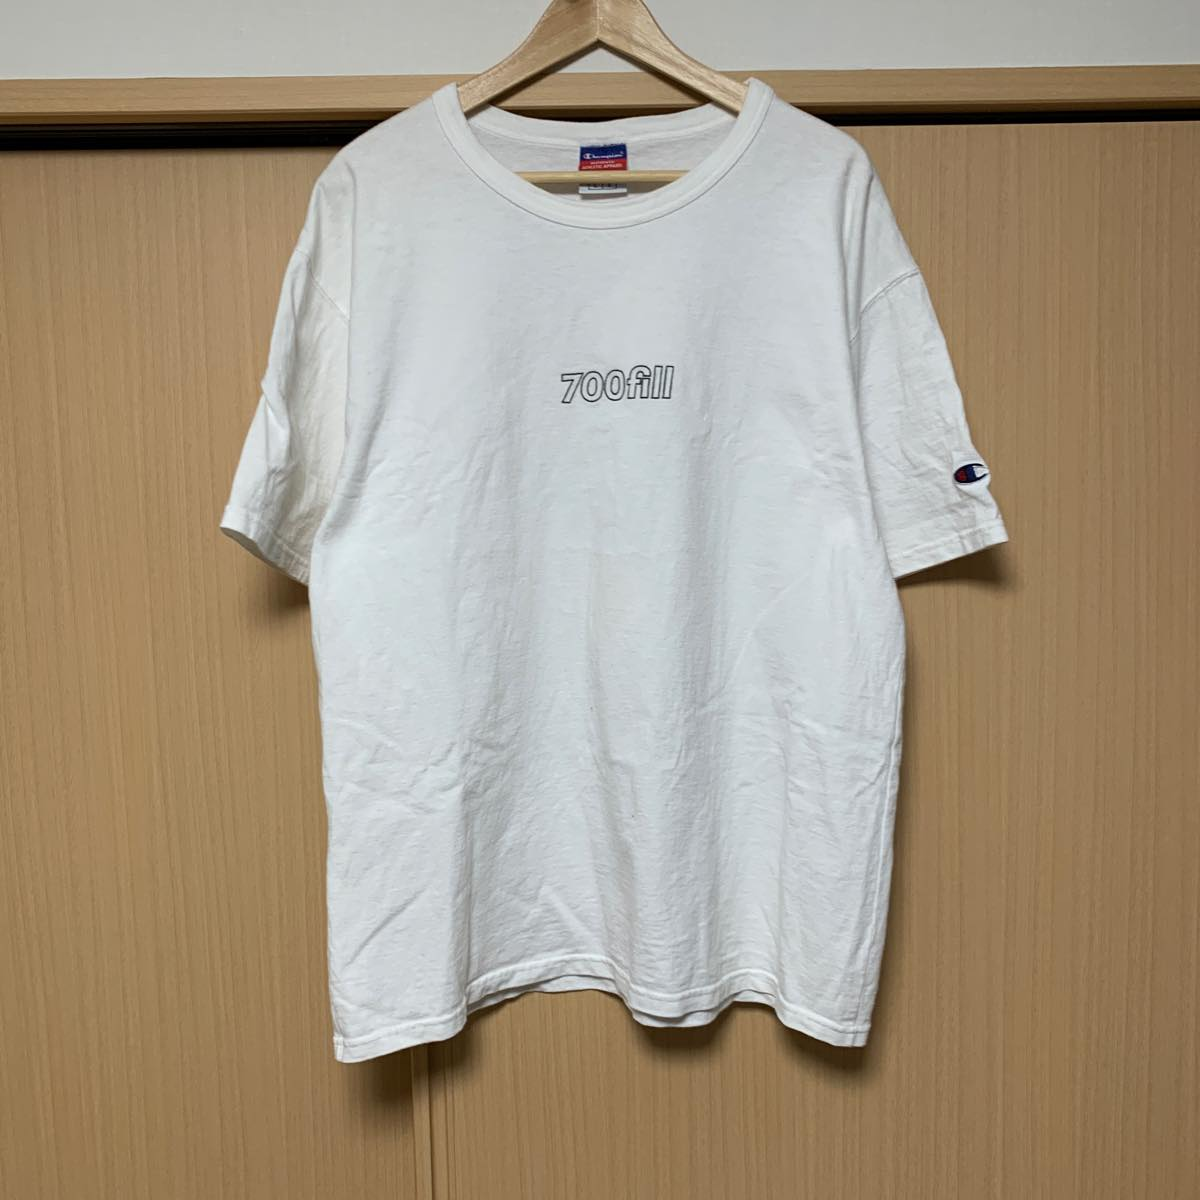 700 Fill 700fill power ロゴ チャンピオン Tシャツ ホワイト